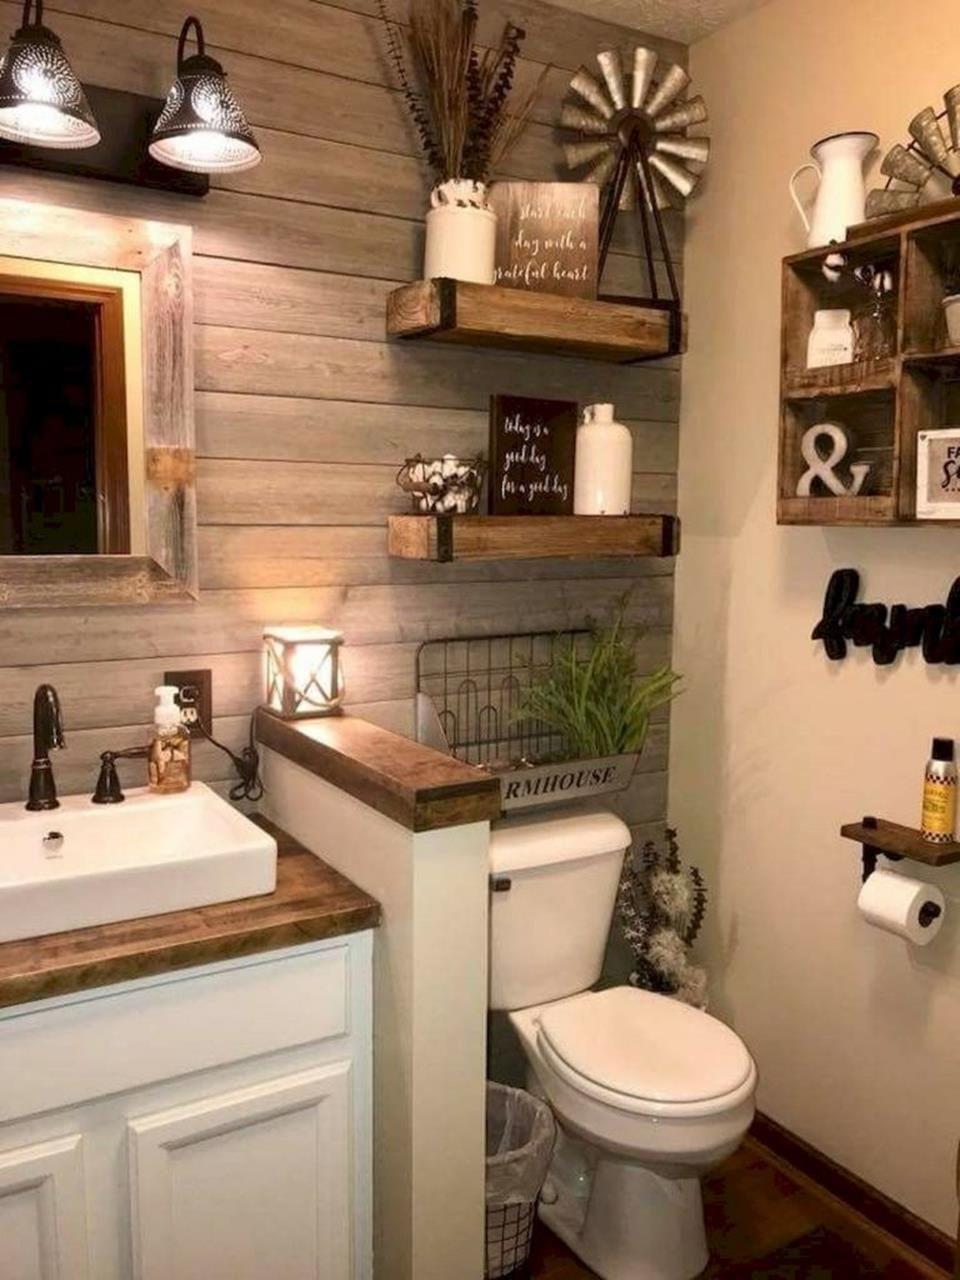 50 Stunning Rustic Farmhouse Bathroom Decorating Ideas 9 Farmhouse Bathroom Decor Bathroom Decor Bathroom Remodel Master